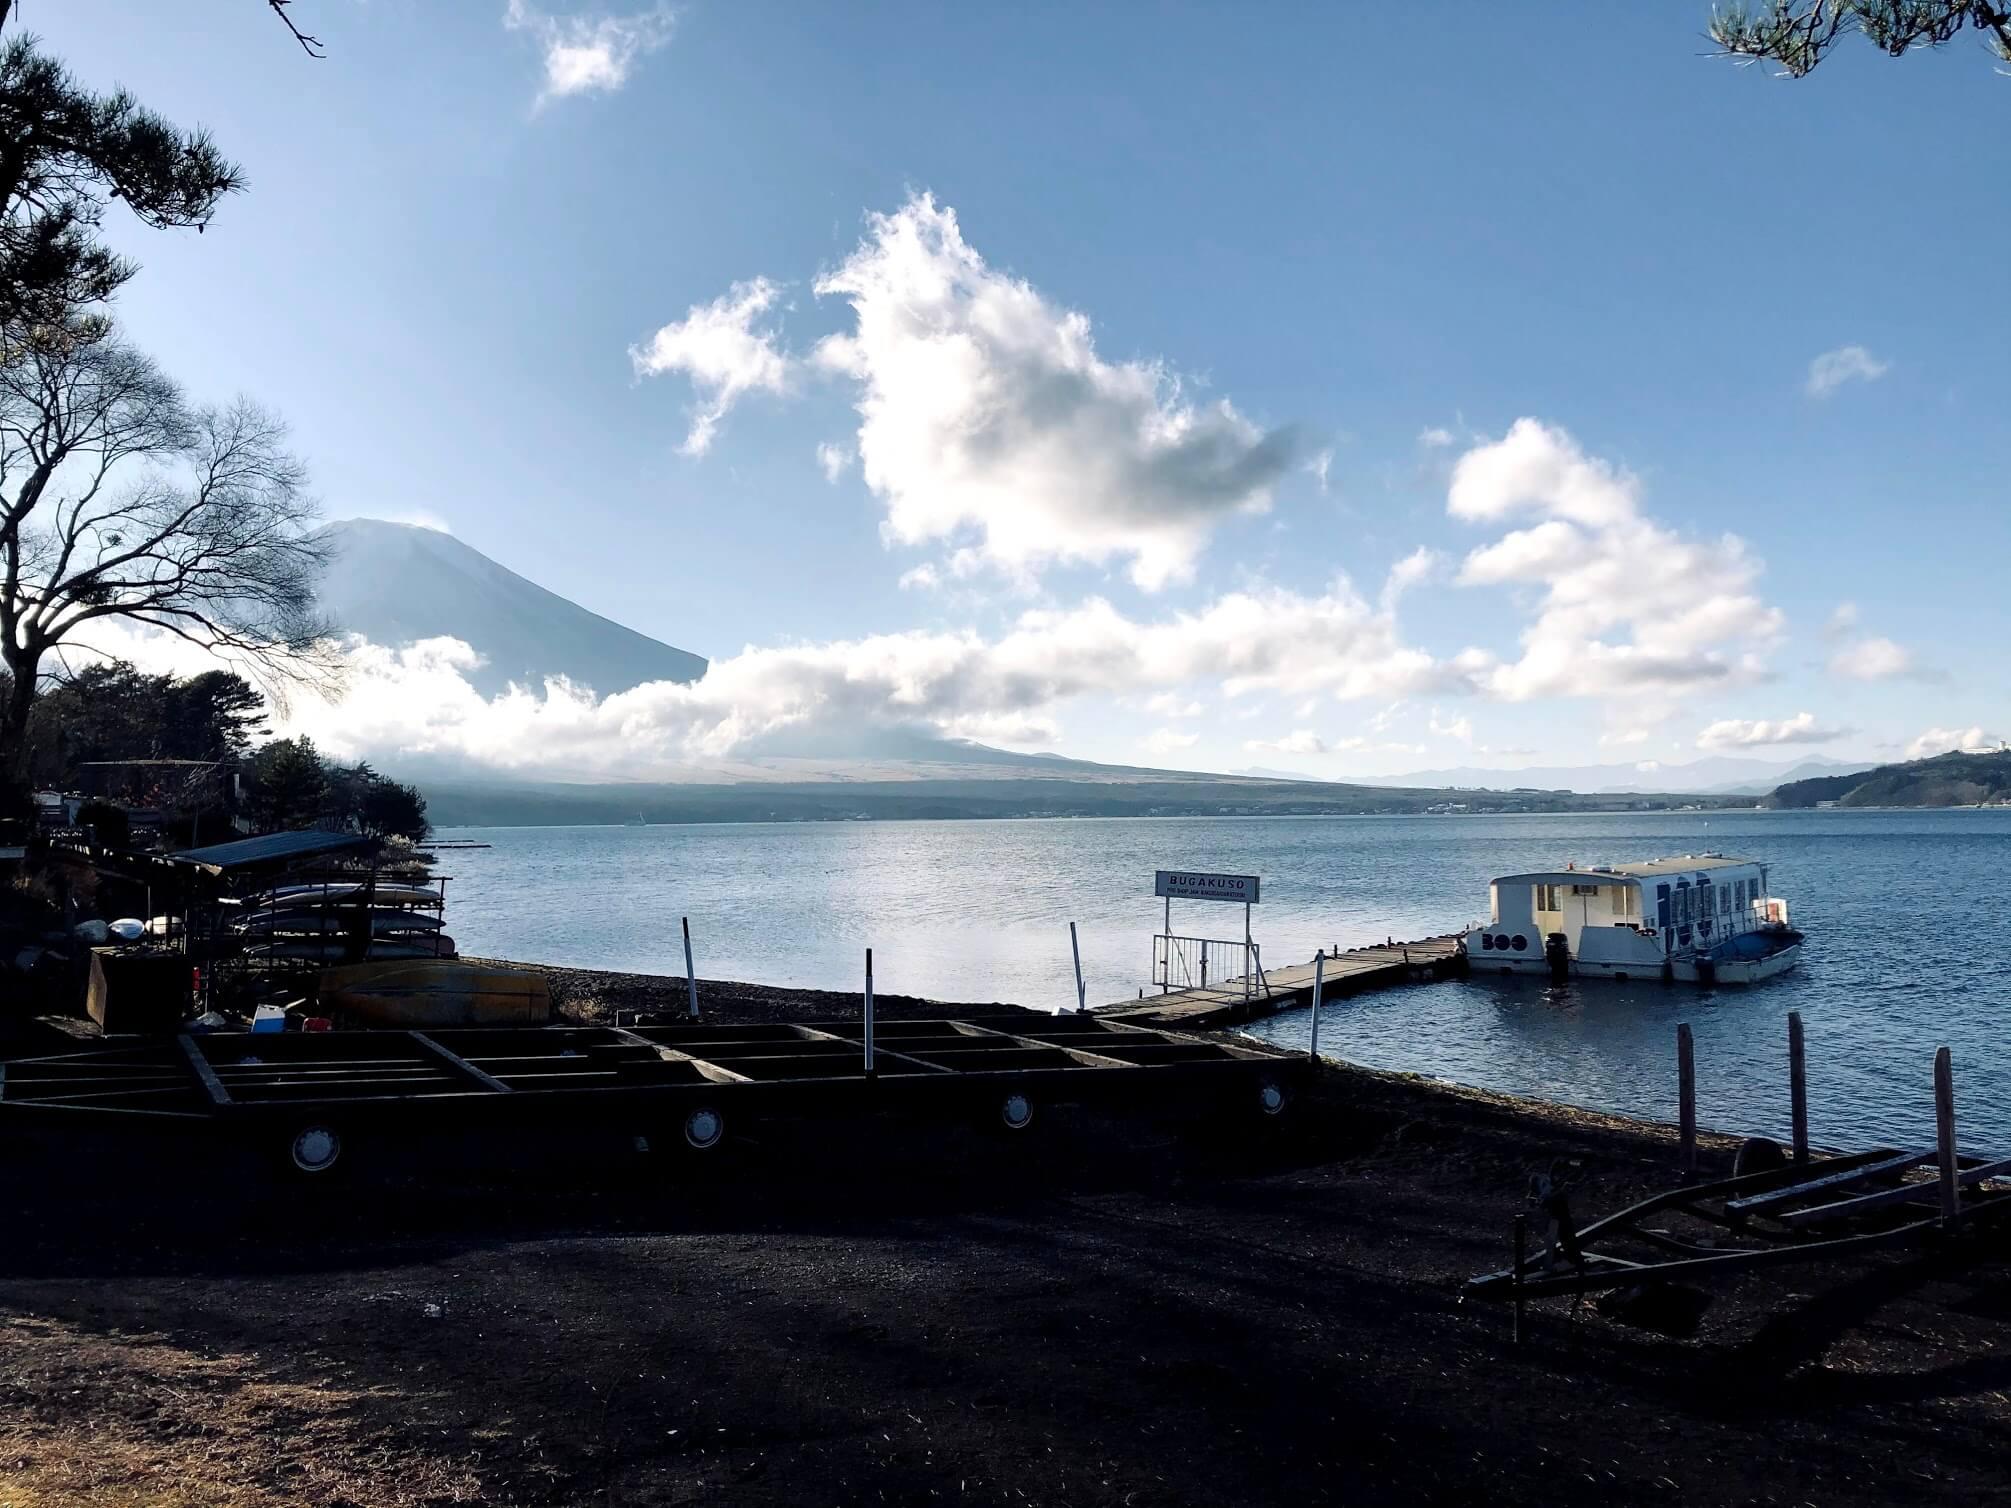 the 508 | Camp(旧:撫岳荘キャンプ場)山中湖